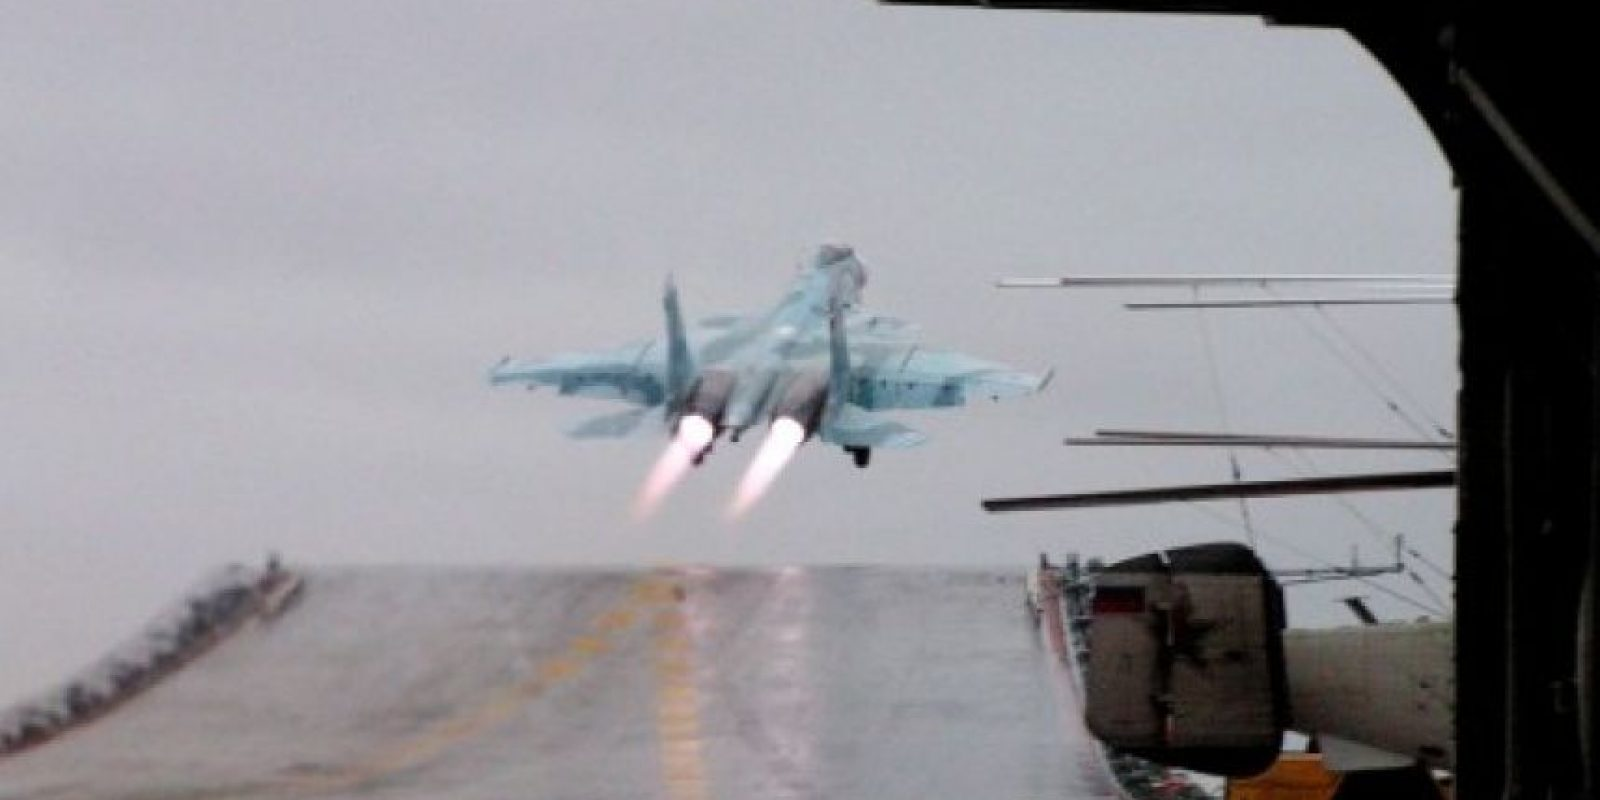 Foto:cazasyhelicopteros.blogspot.com. Imagen Por: